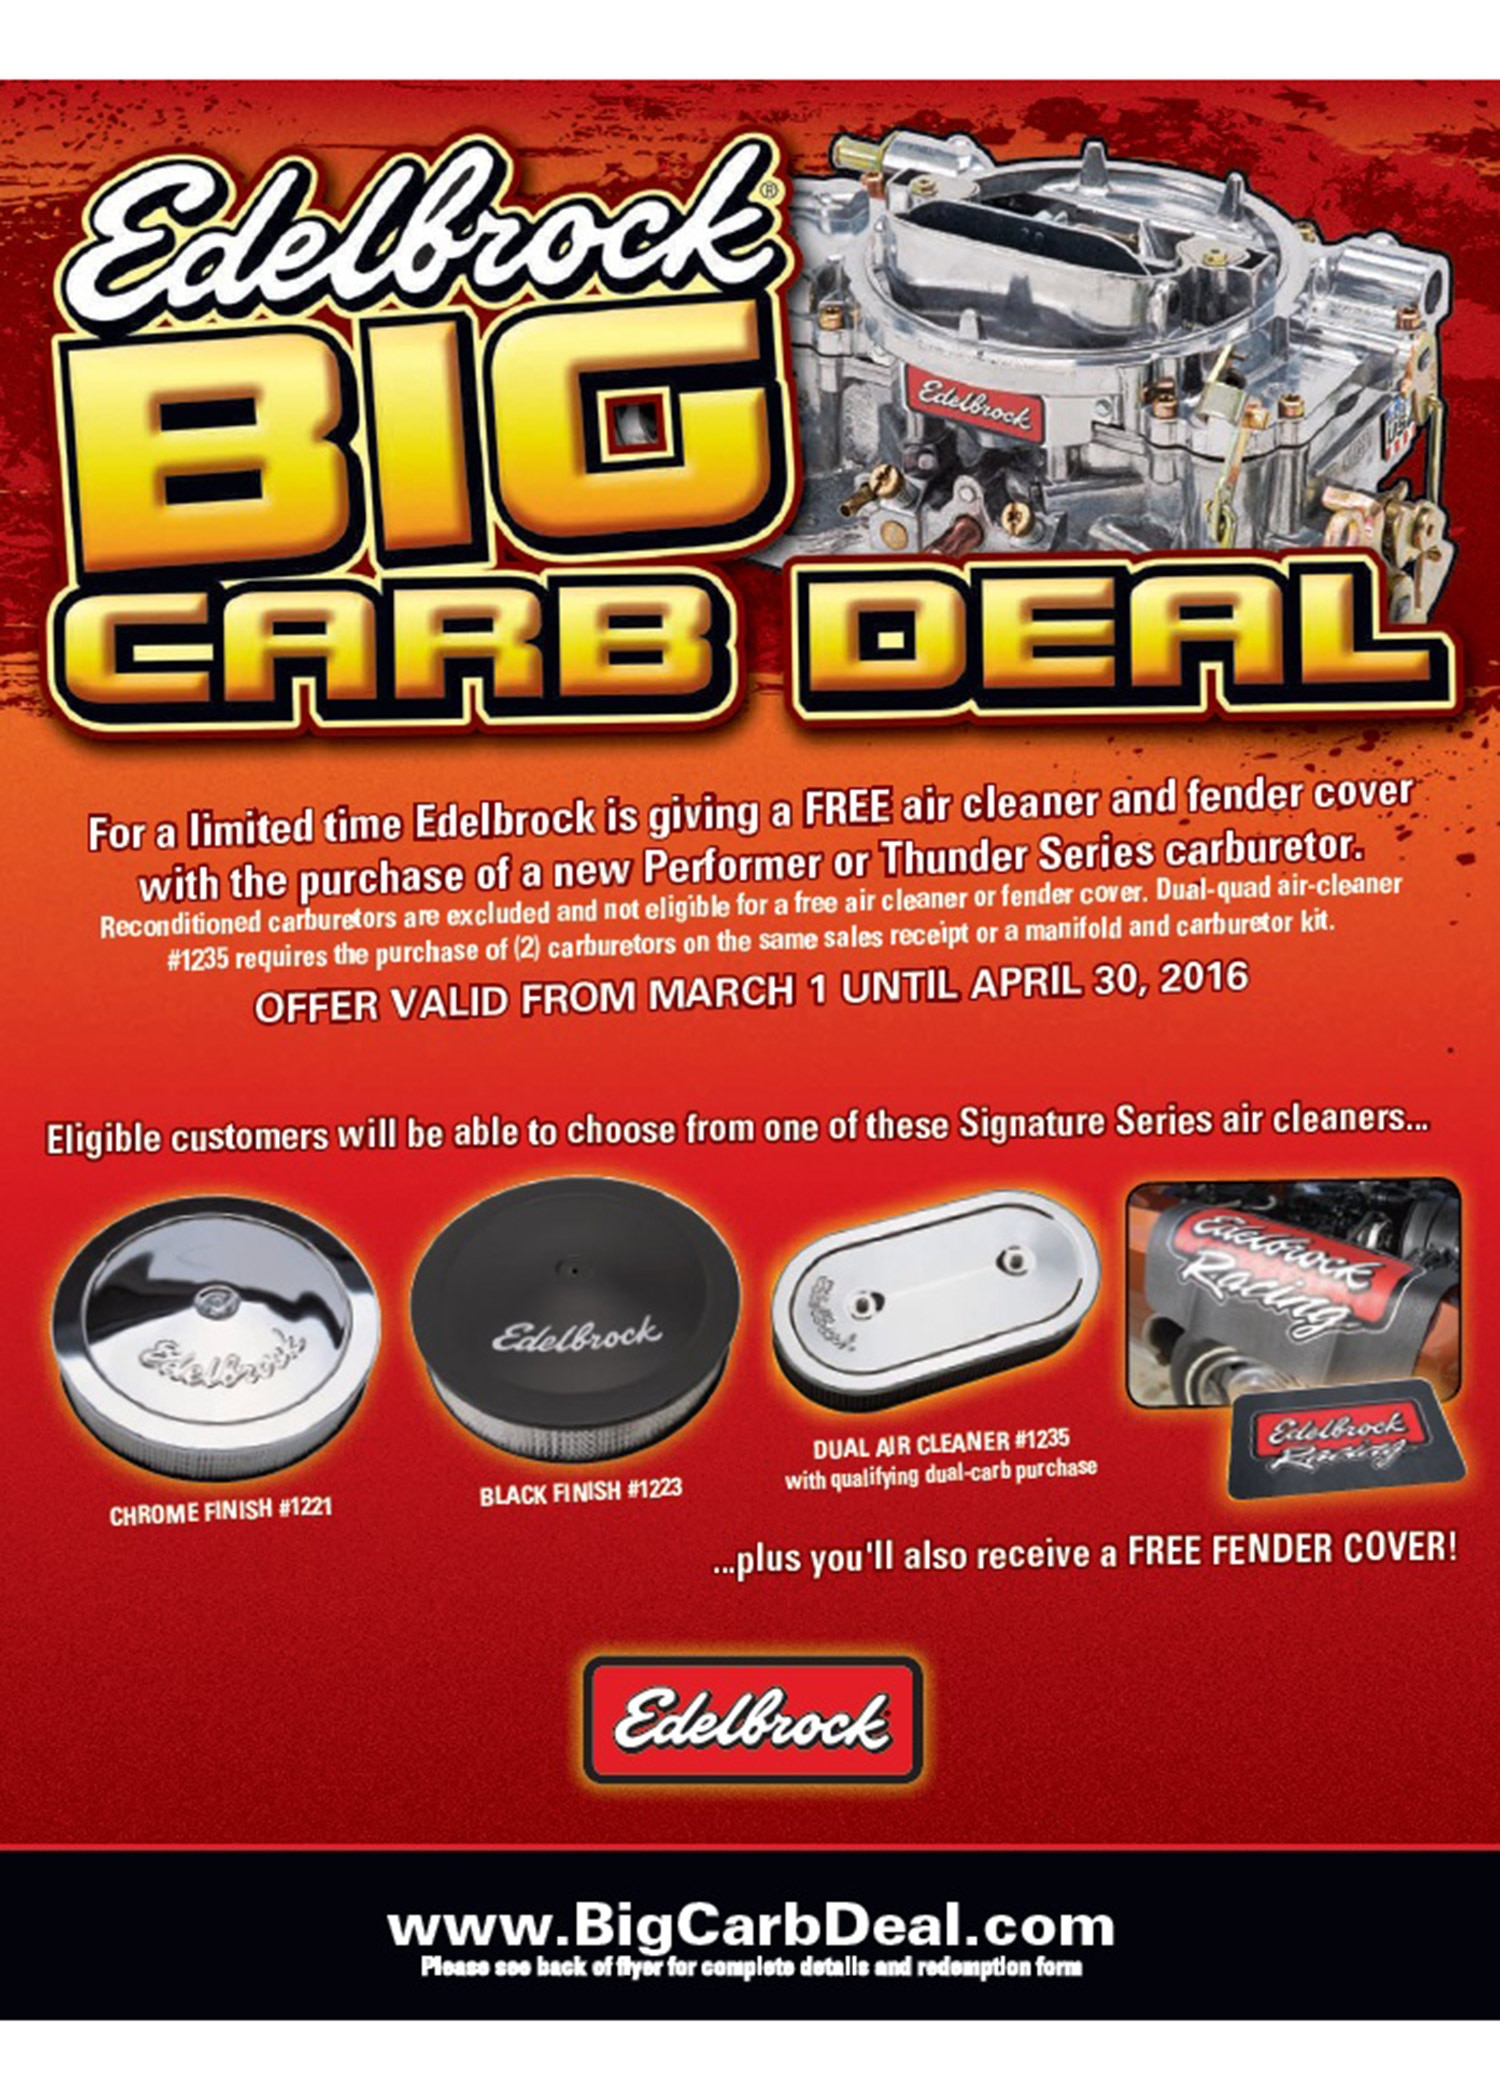 Edelbrock Big Carb Deal 03